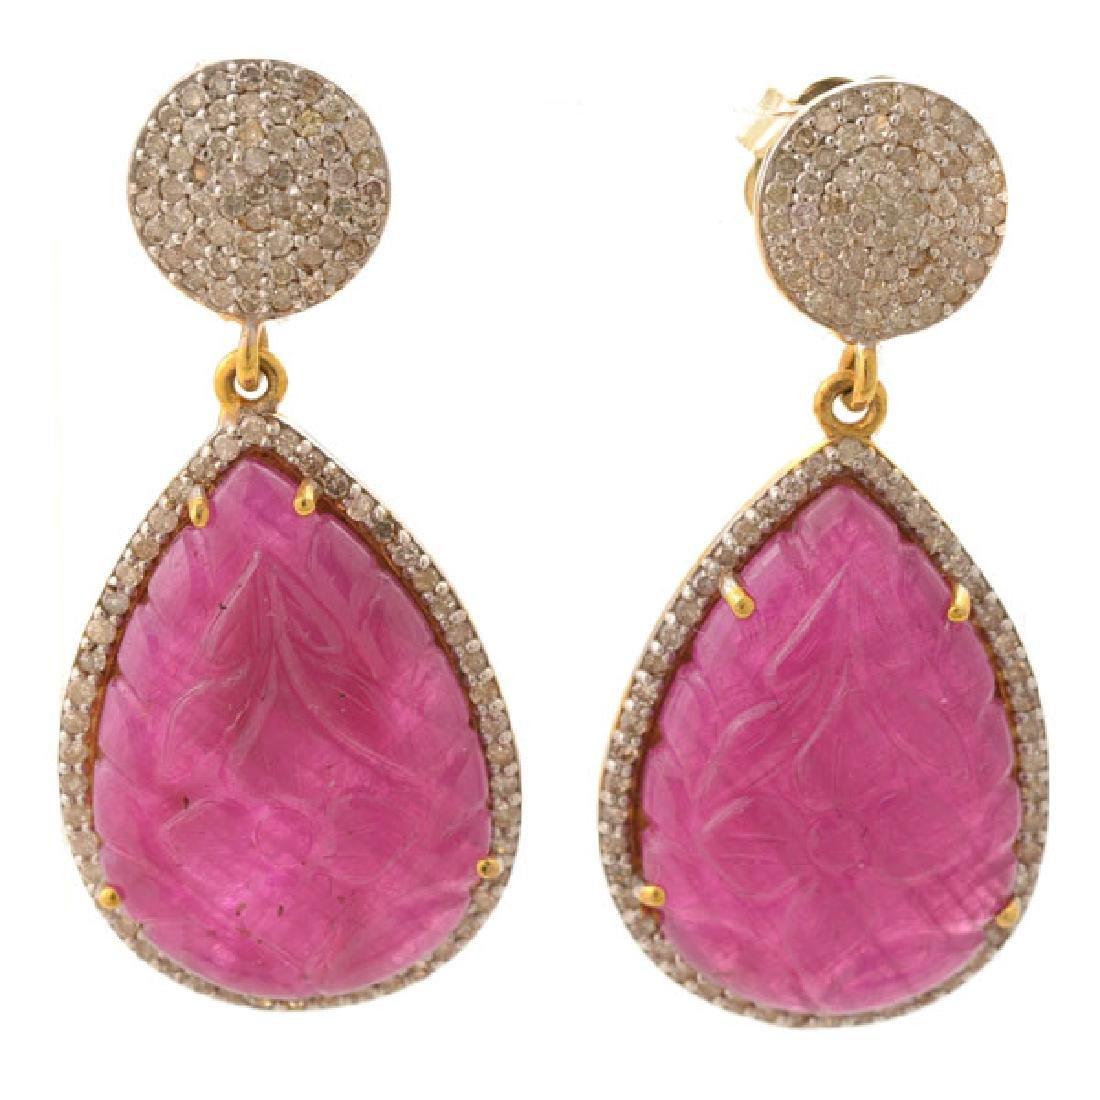 Pair of Ruby, Diamond, 14k Yellow Gold Earrings.